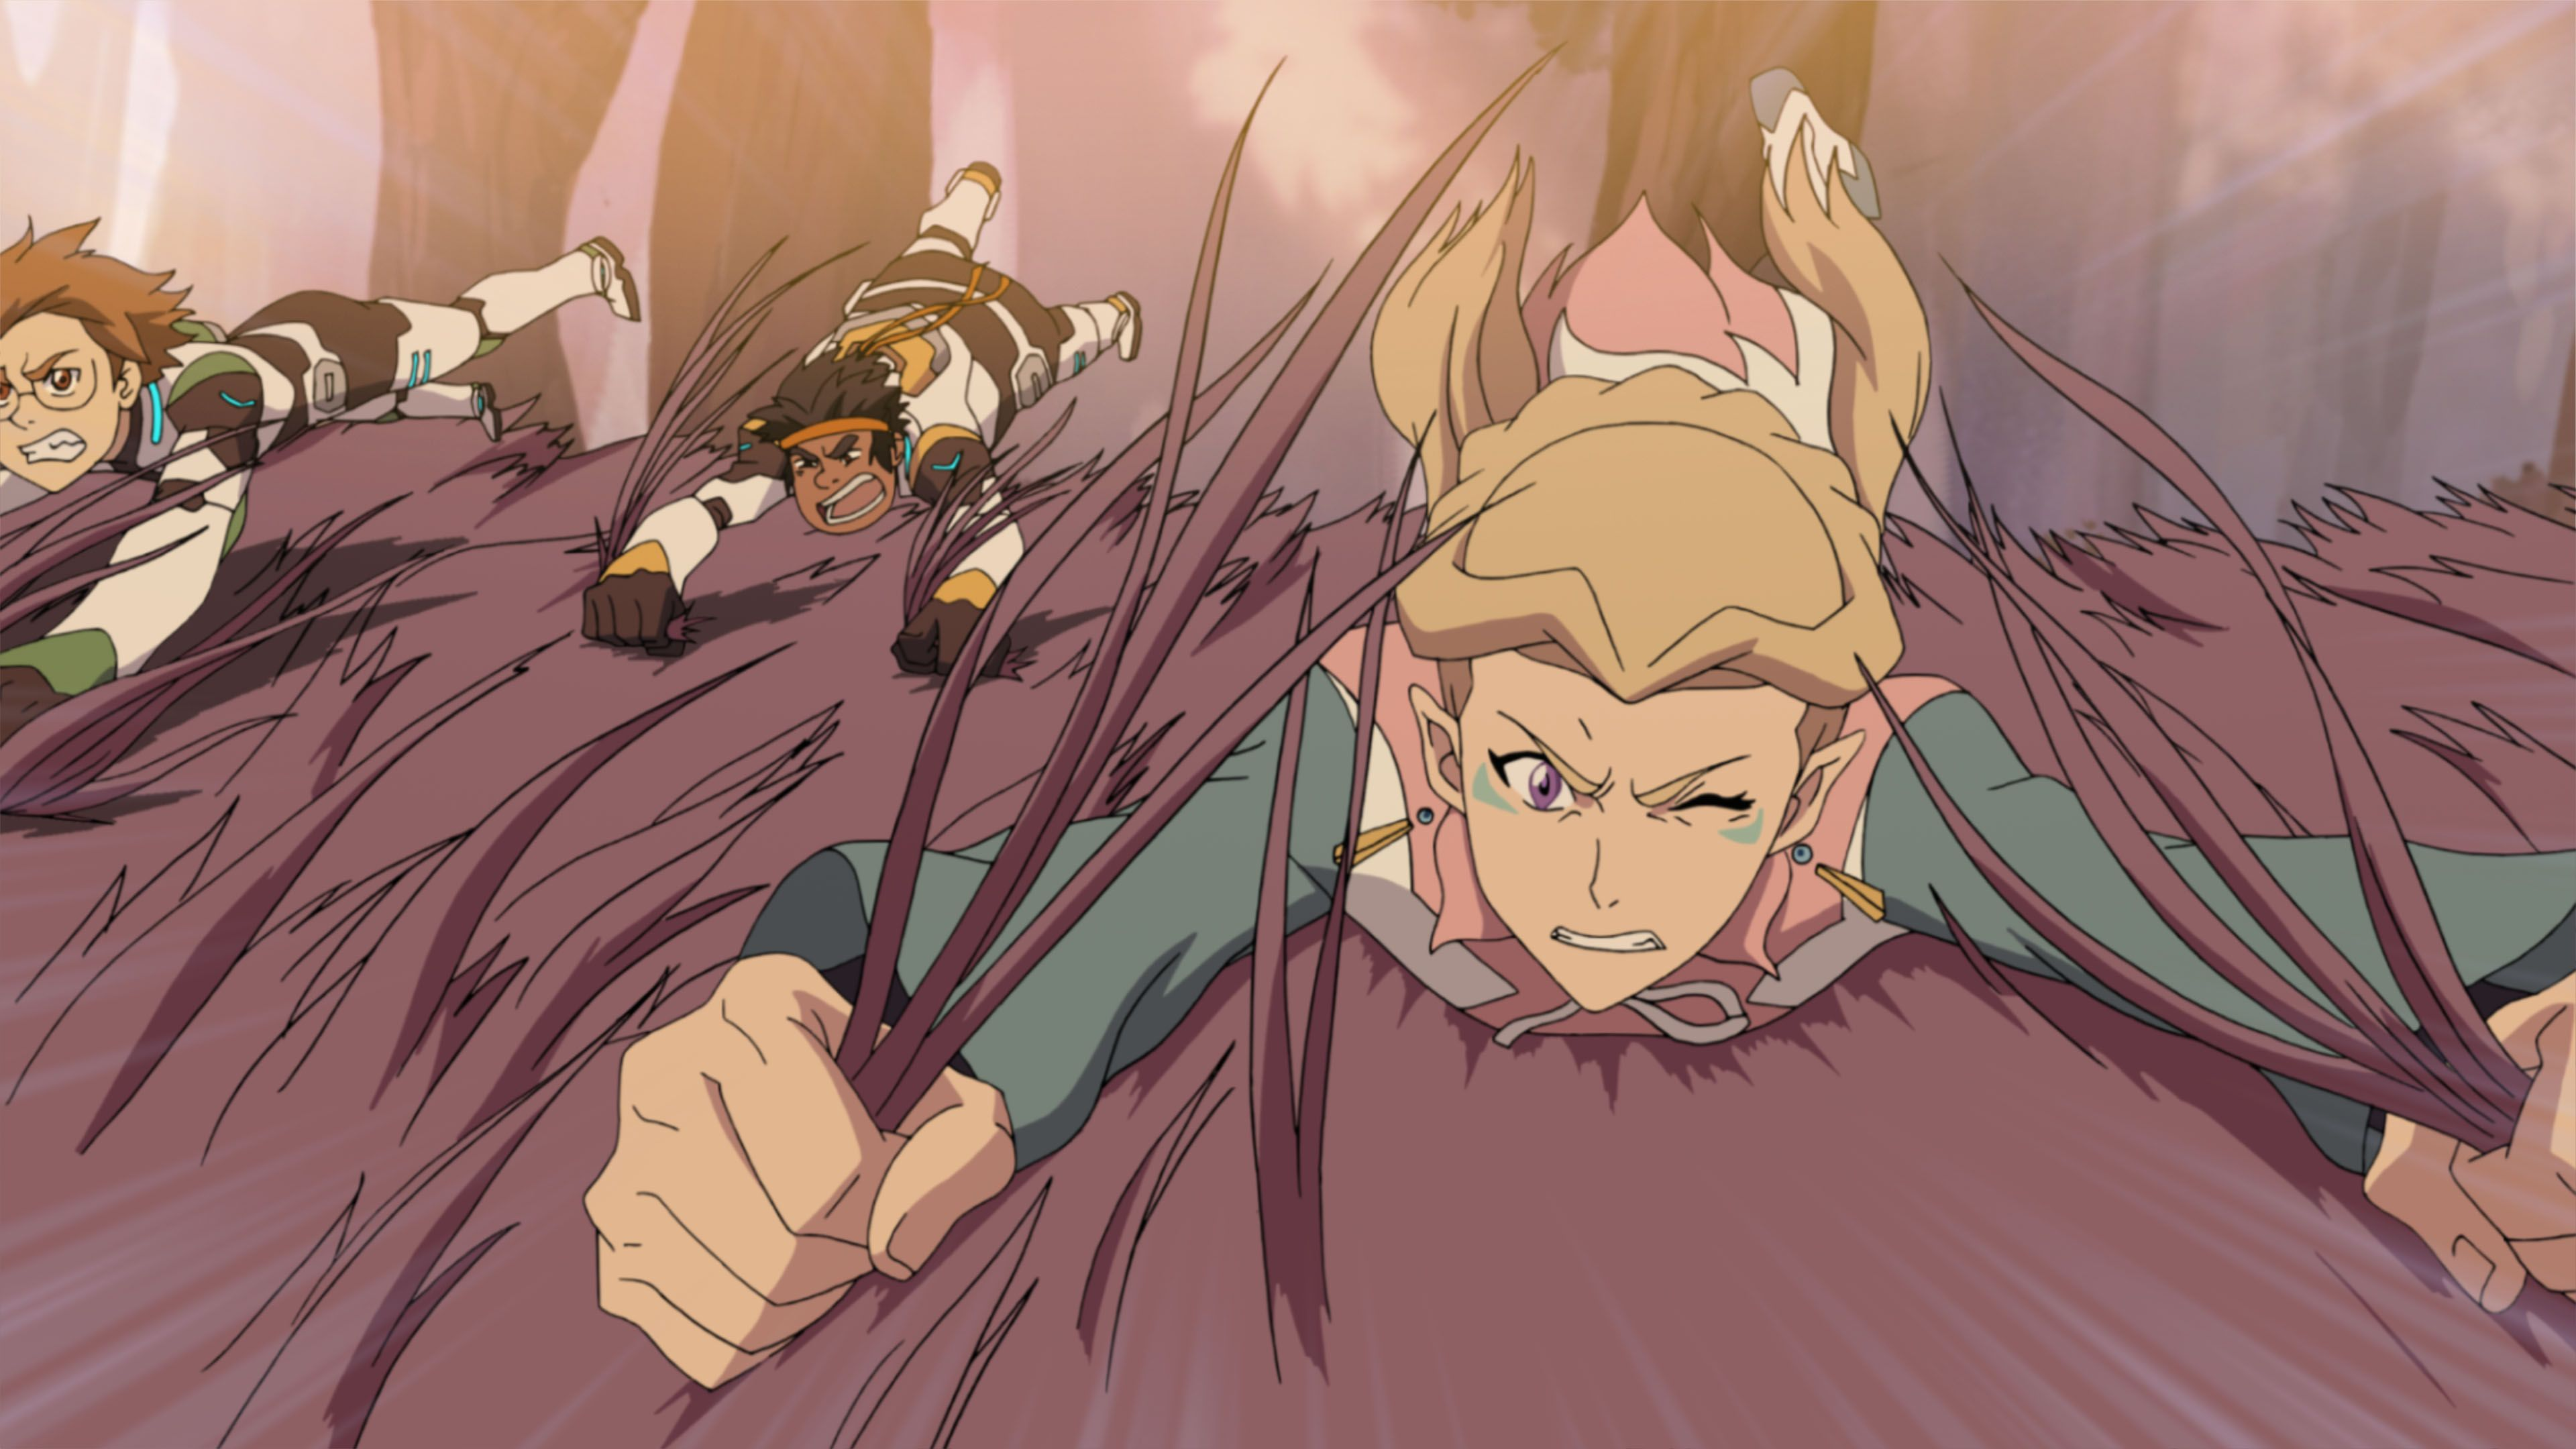 Voltron Season 7 Episode 1 Focuses on the Shiro-Keith Relationship